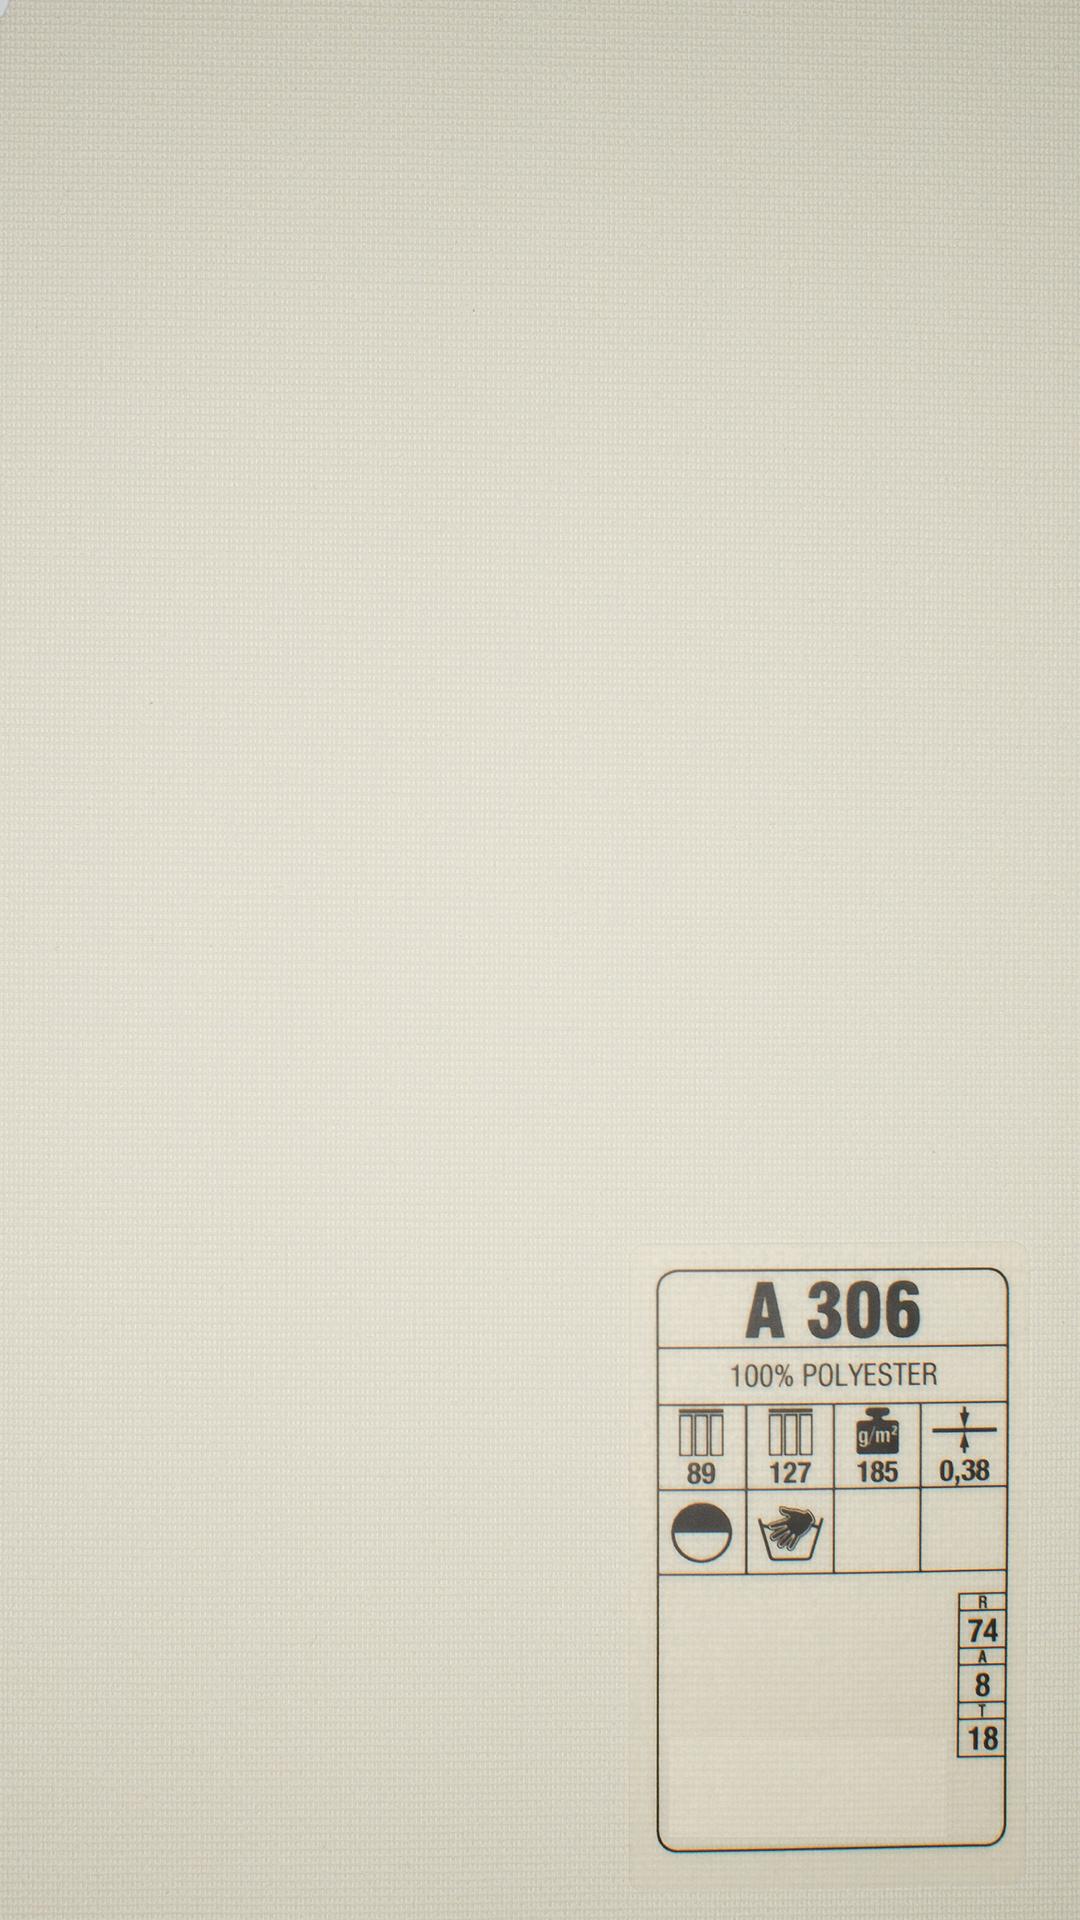 A 306